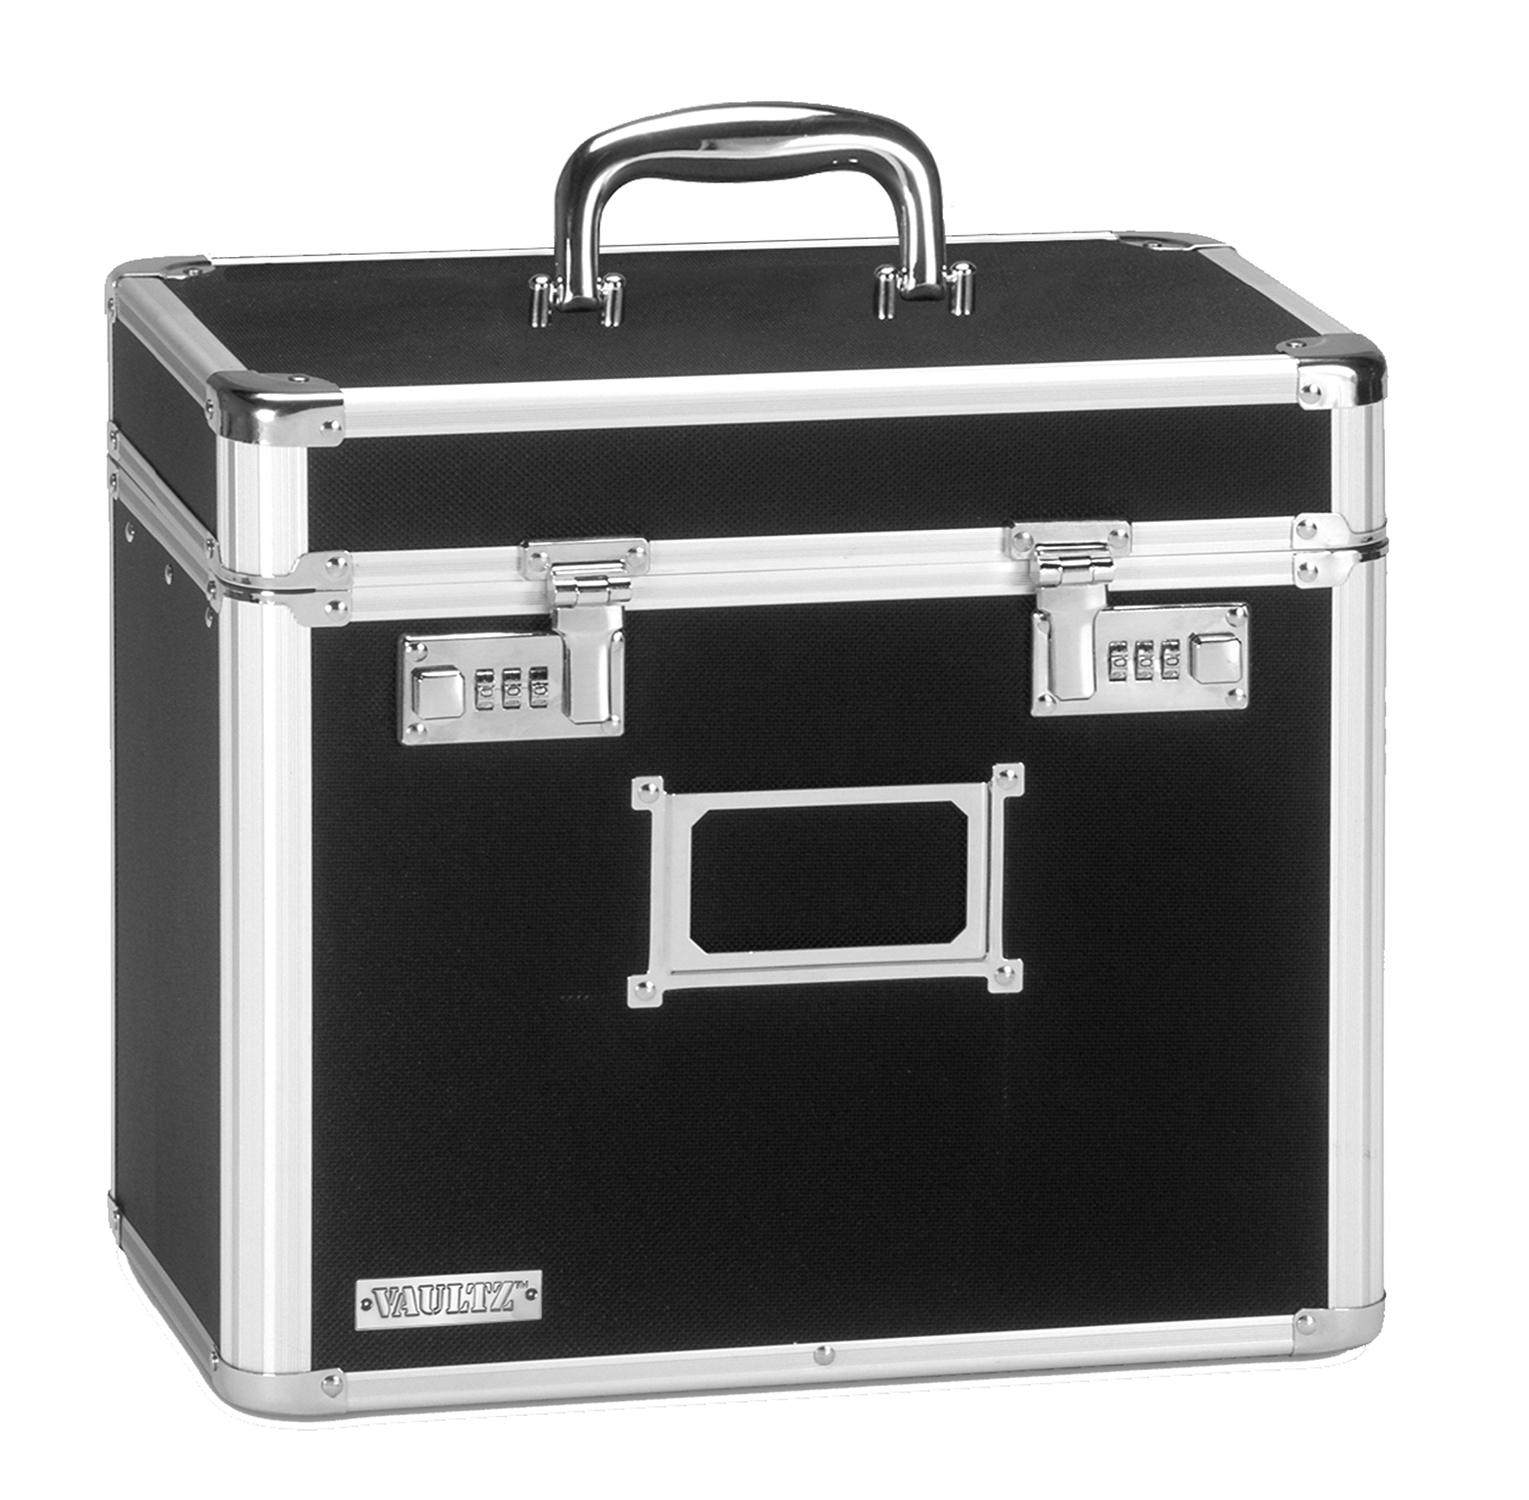 Locking File Tote Storage Box, Letter, 13-3/4 x 7-1/4 x 12-1/4, Black